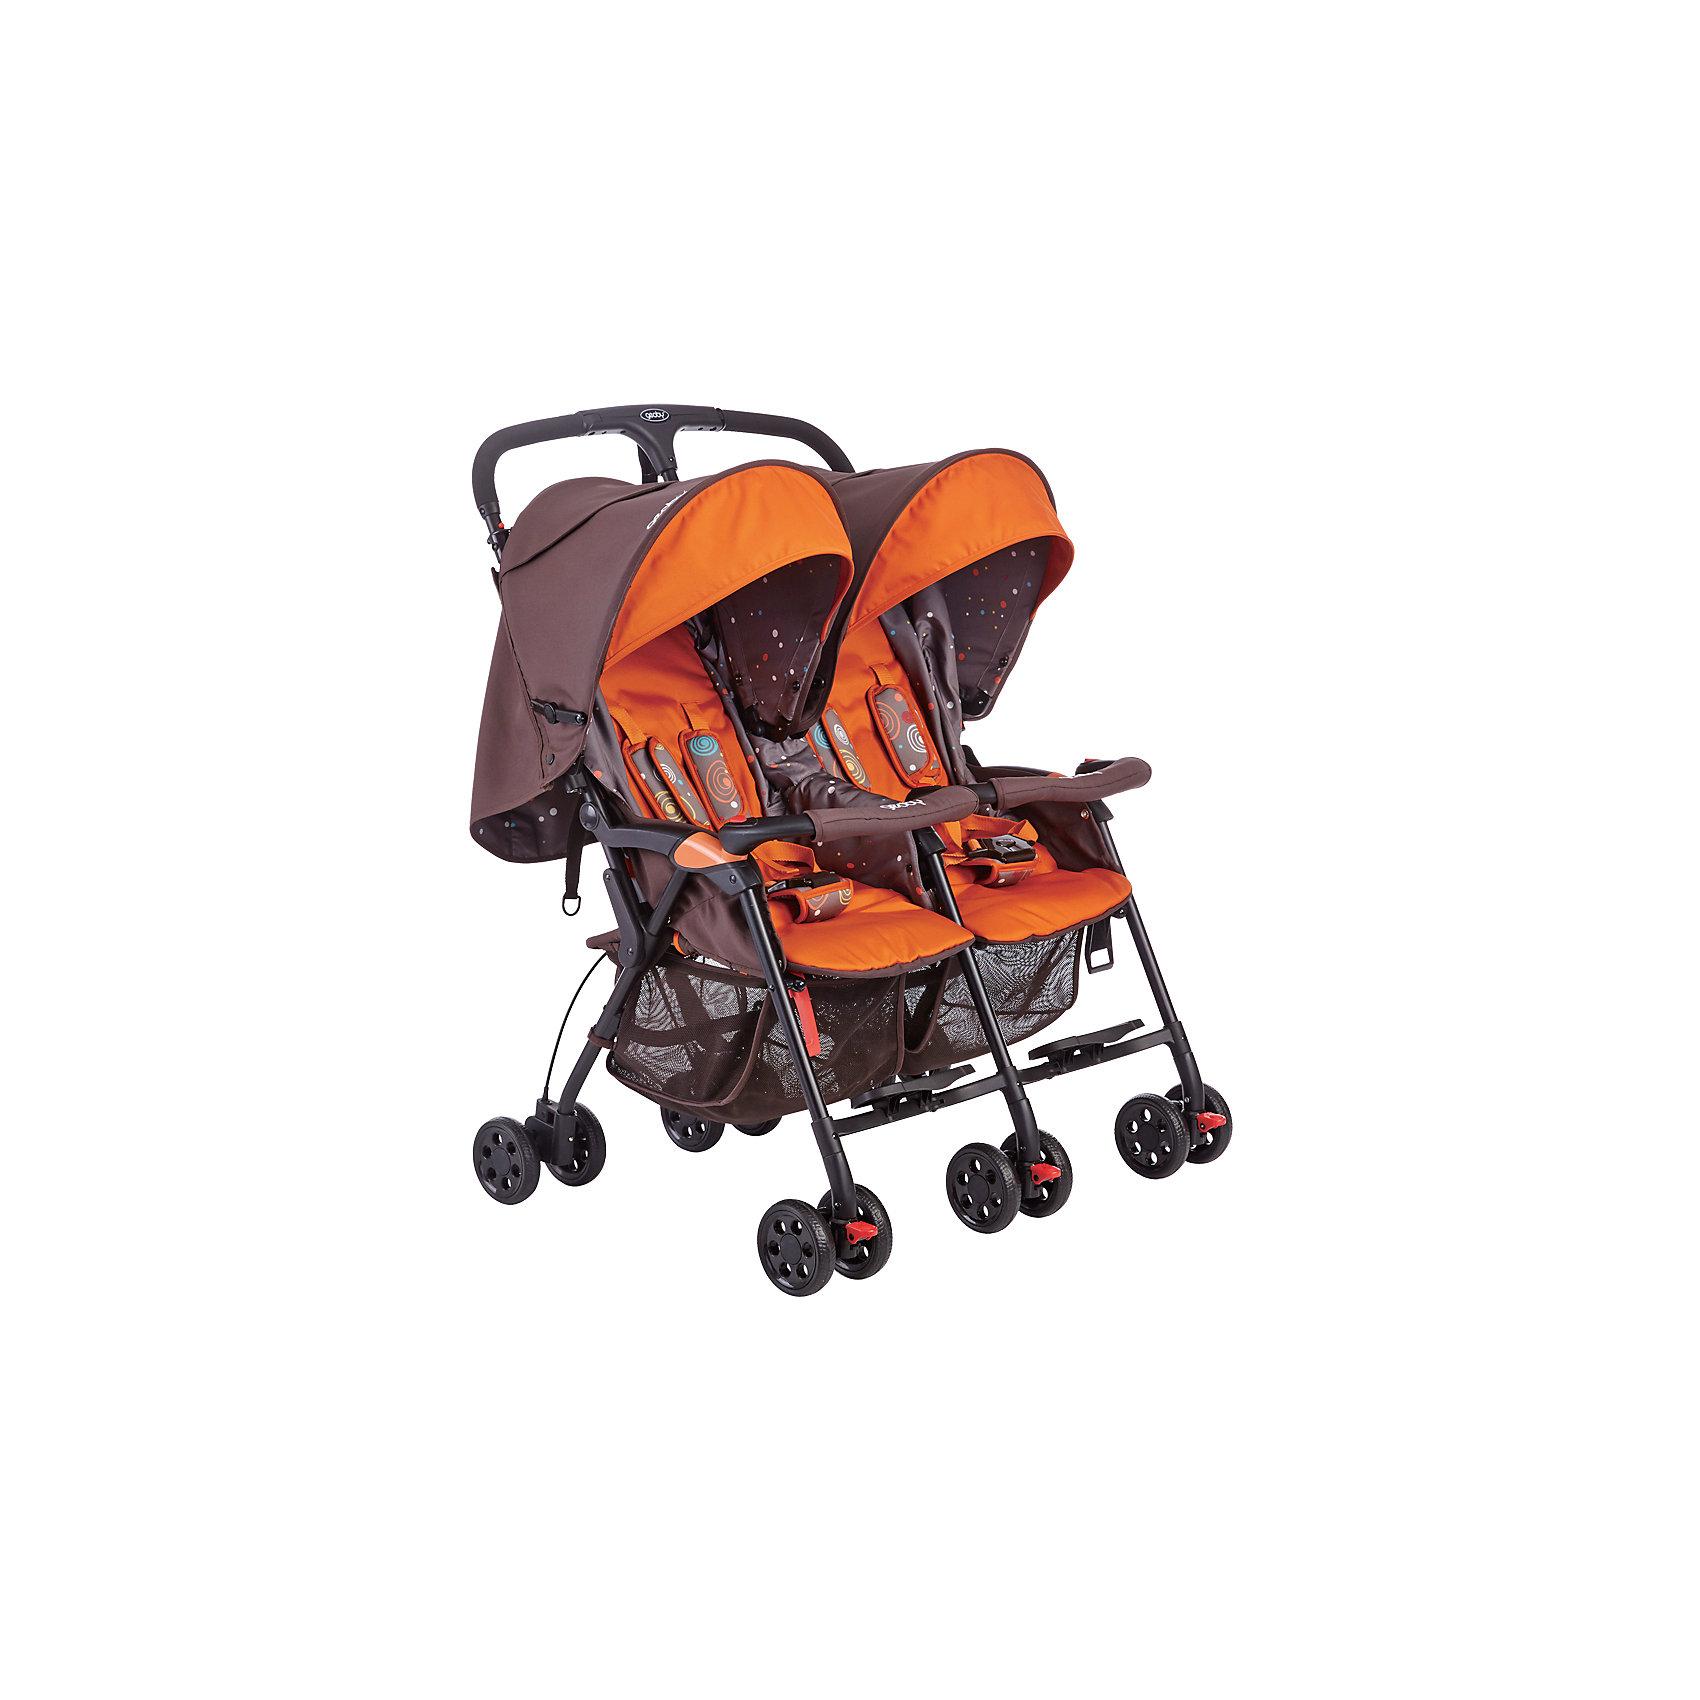 Прогулочная коляска для двойни Geoby 05SD593E, коричнево-оранжевый